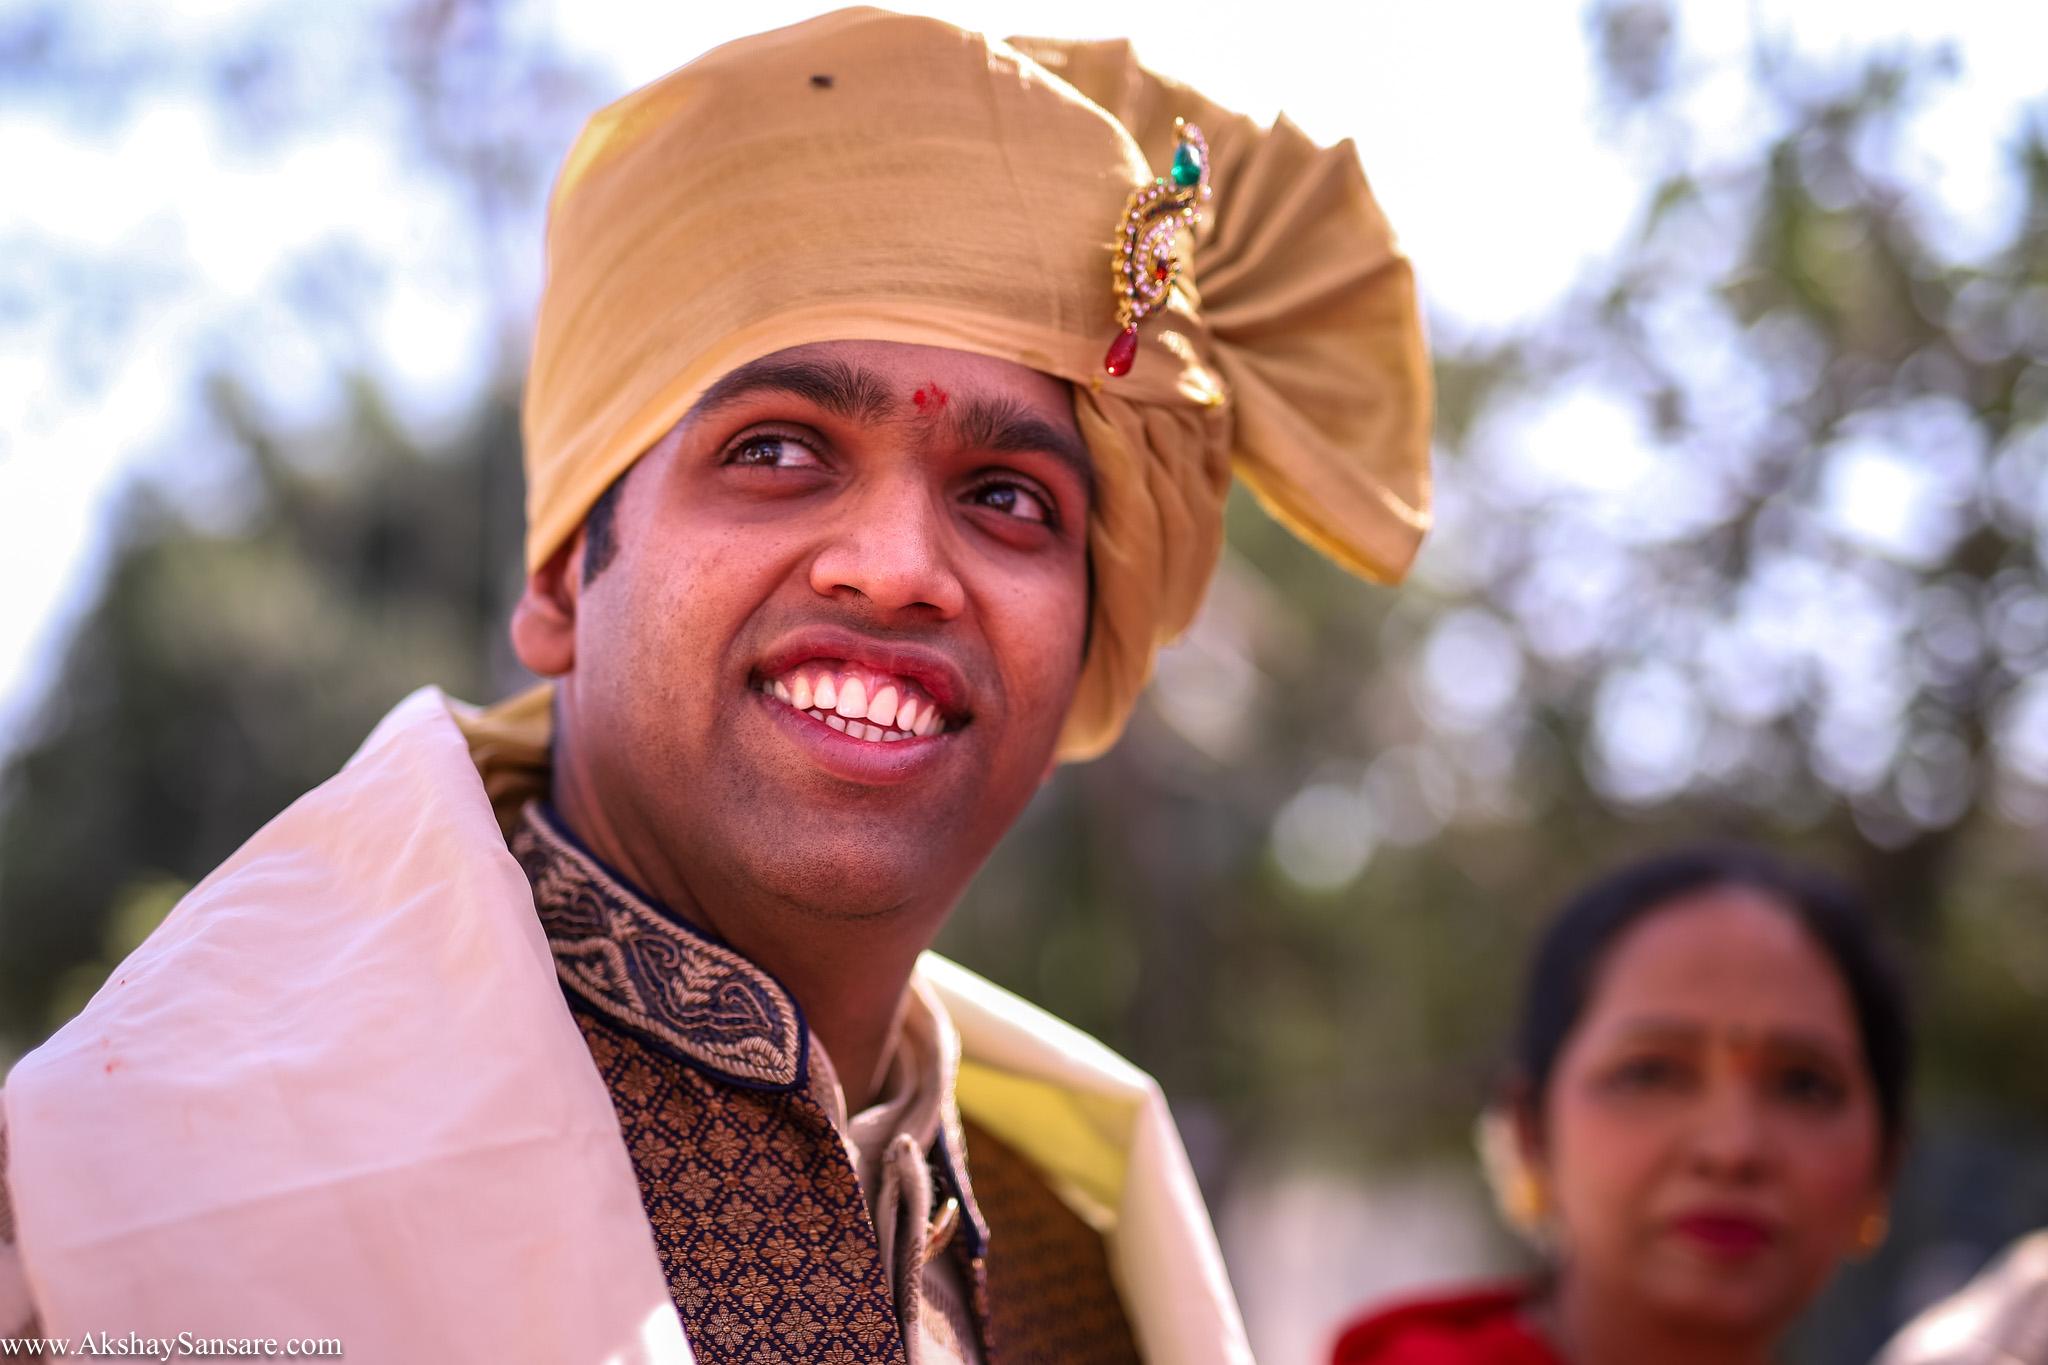 Salil x Kimaya Akshay Sansare Photography Candid wedding Photographer in mumbai best(11).jpg